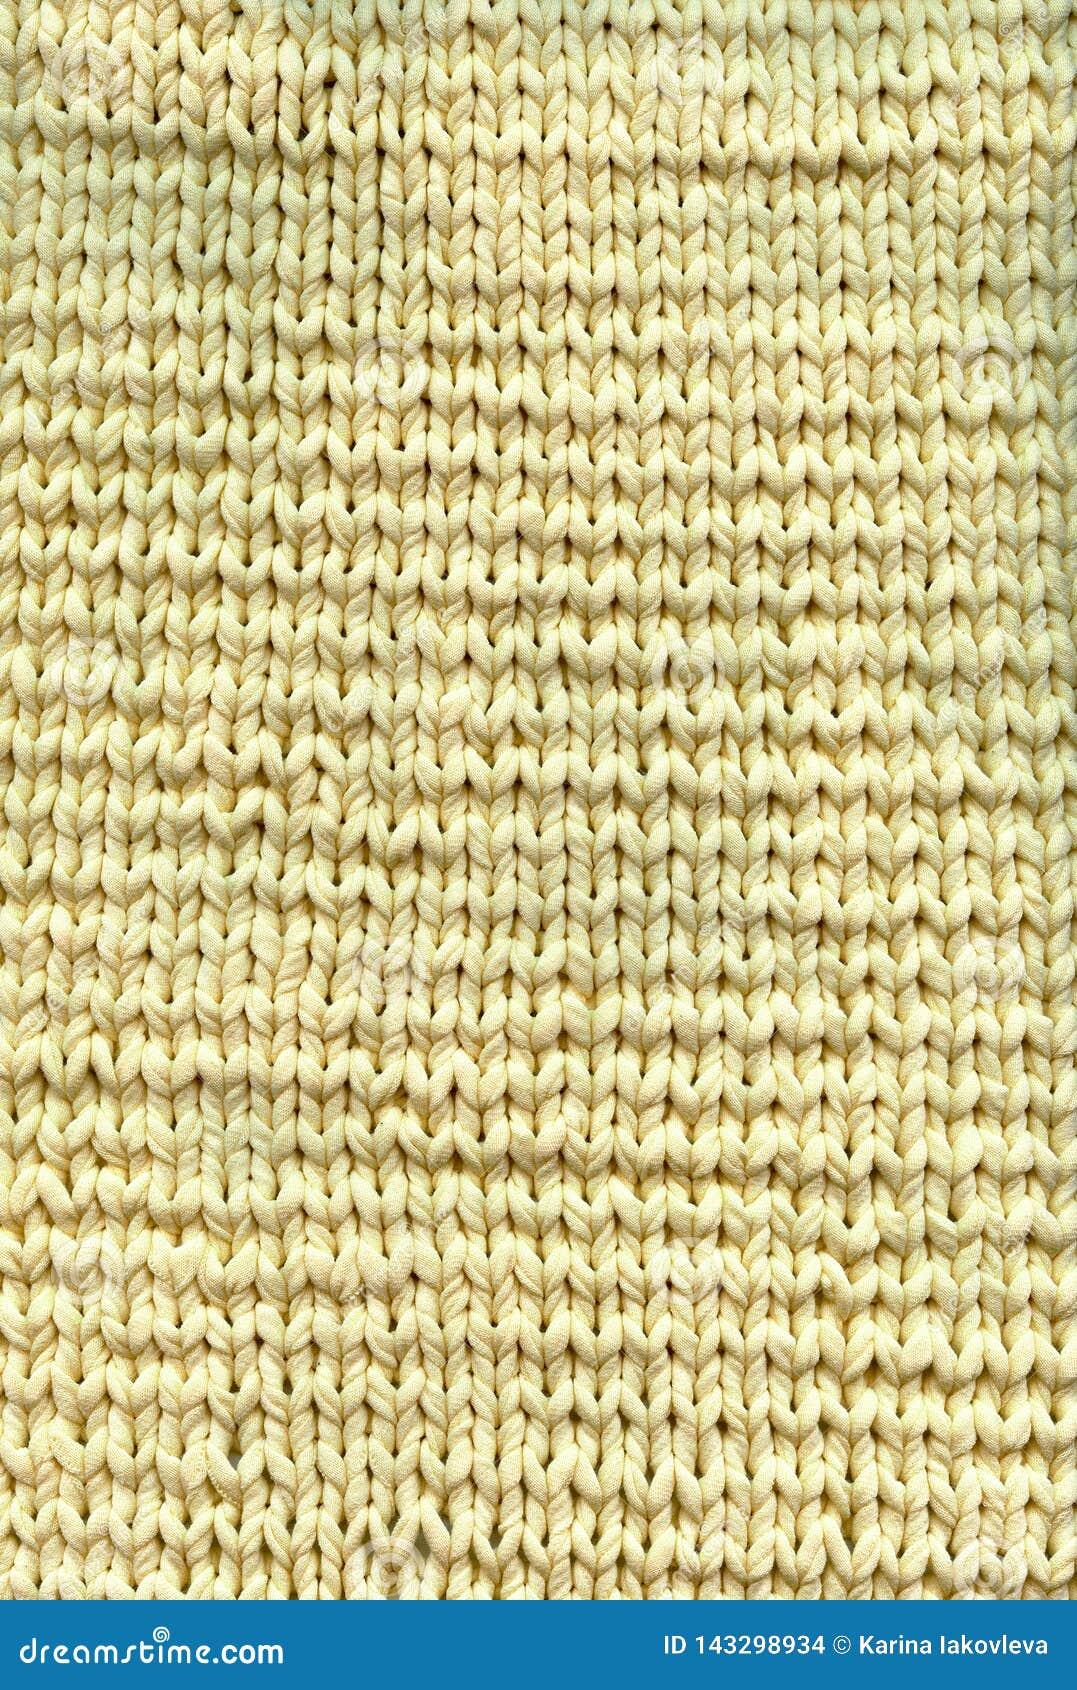 Photo of texture of knitting handmade blanket